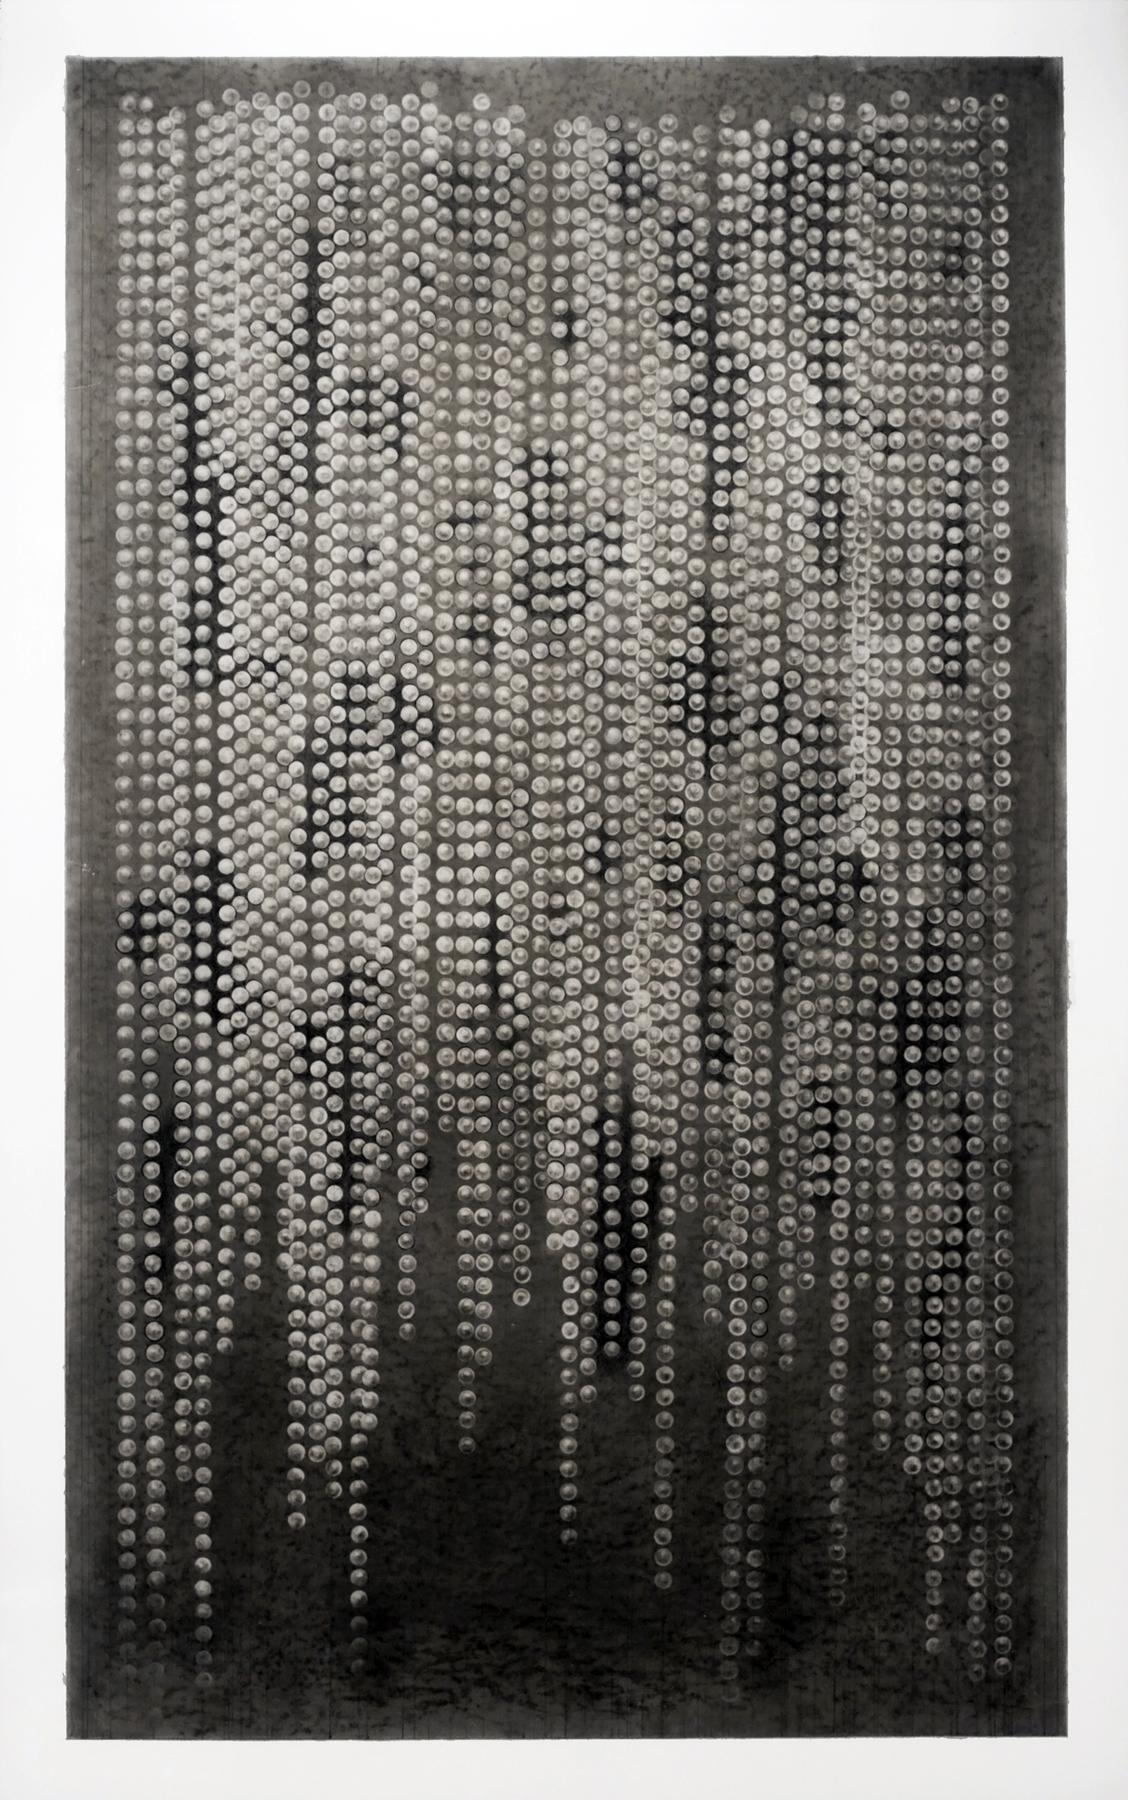 Stringless beads